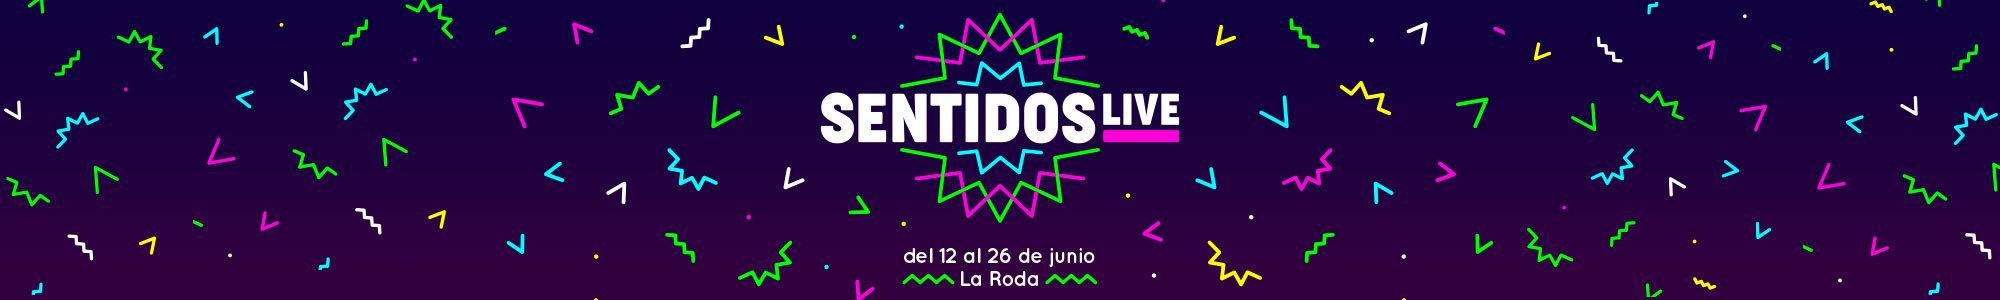 Sentidos live mb